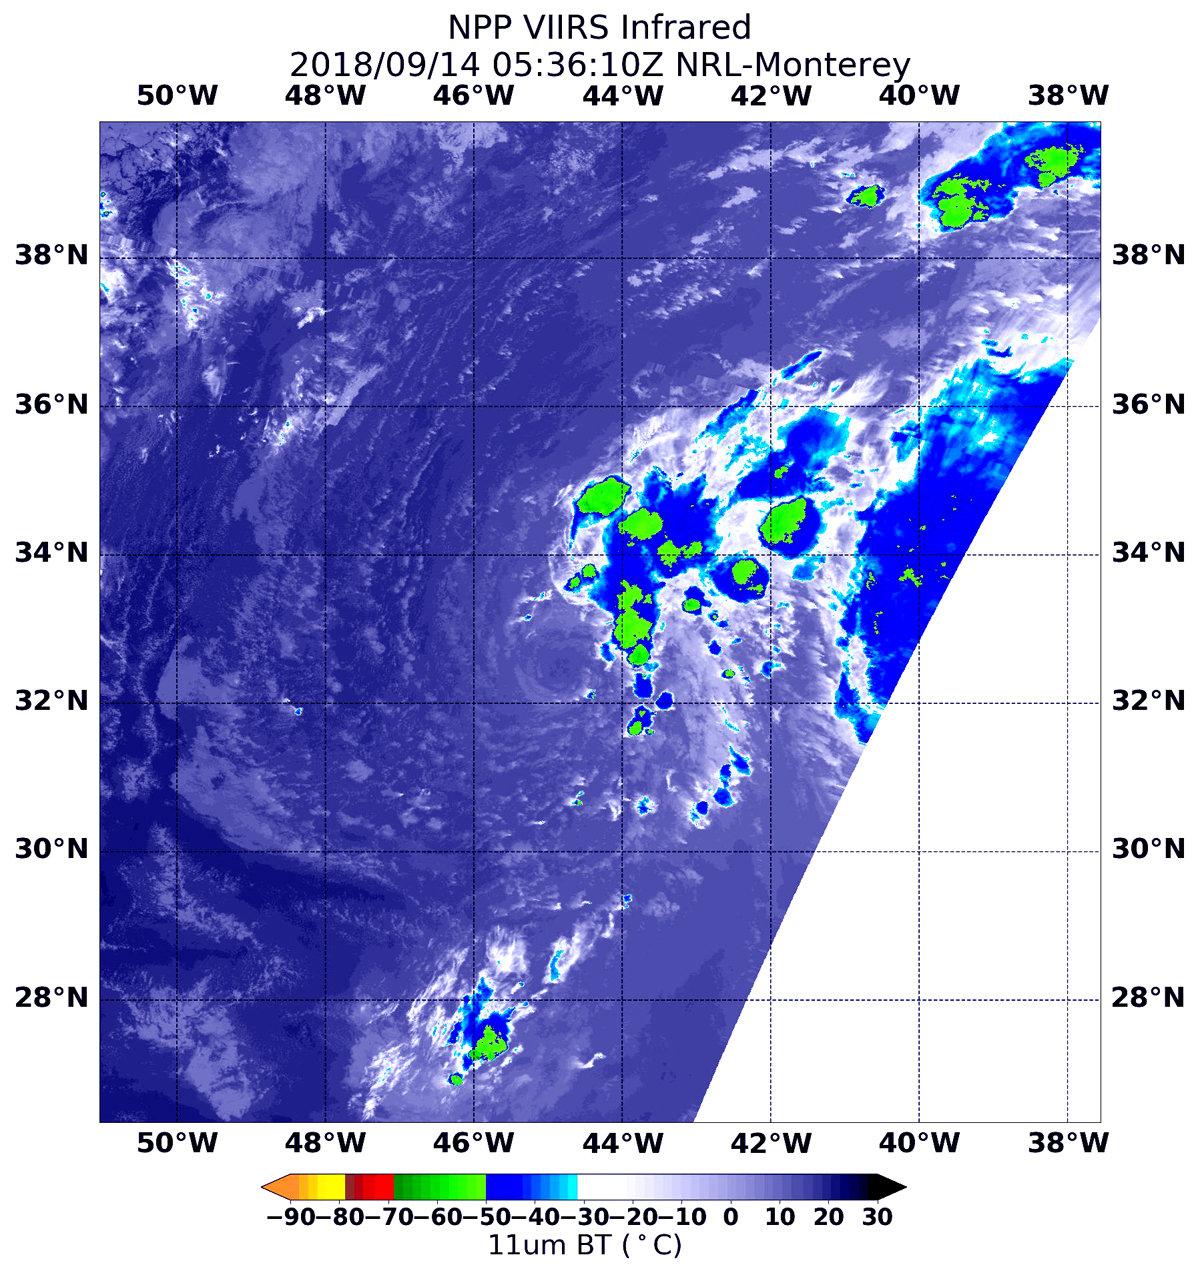 Wind Shear Affecting Tropical Storm Joyce In Nasa Noaa Satellite Image